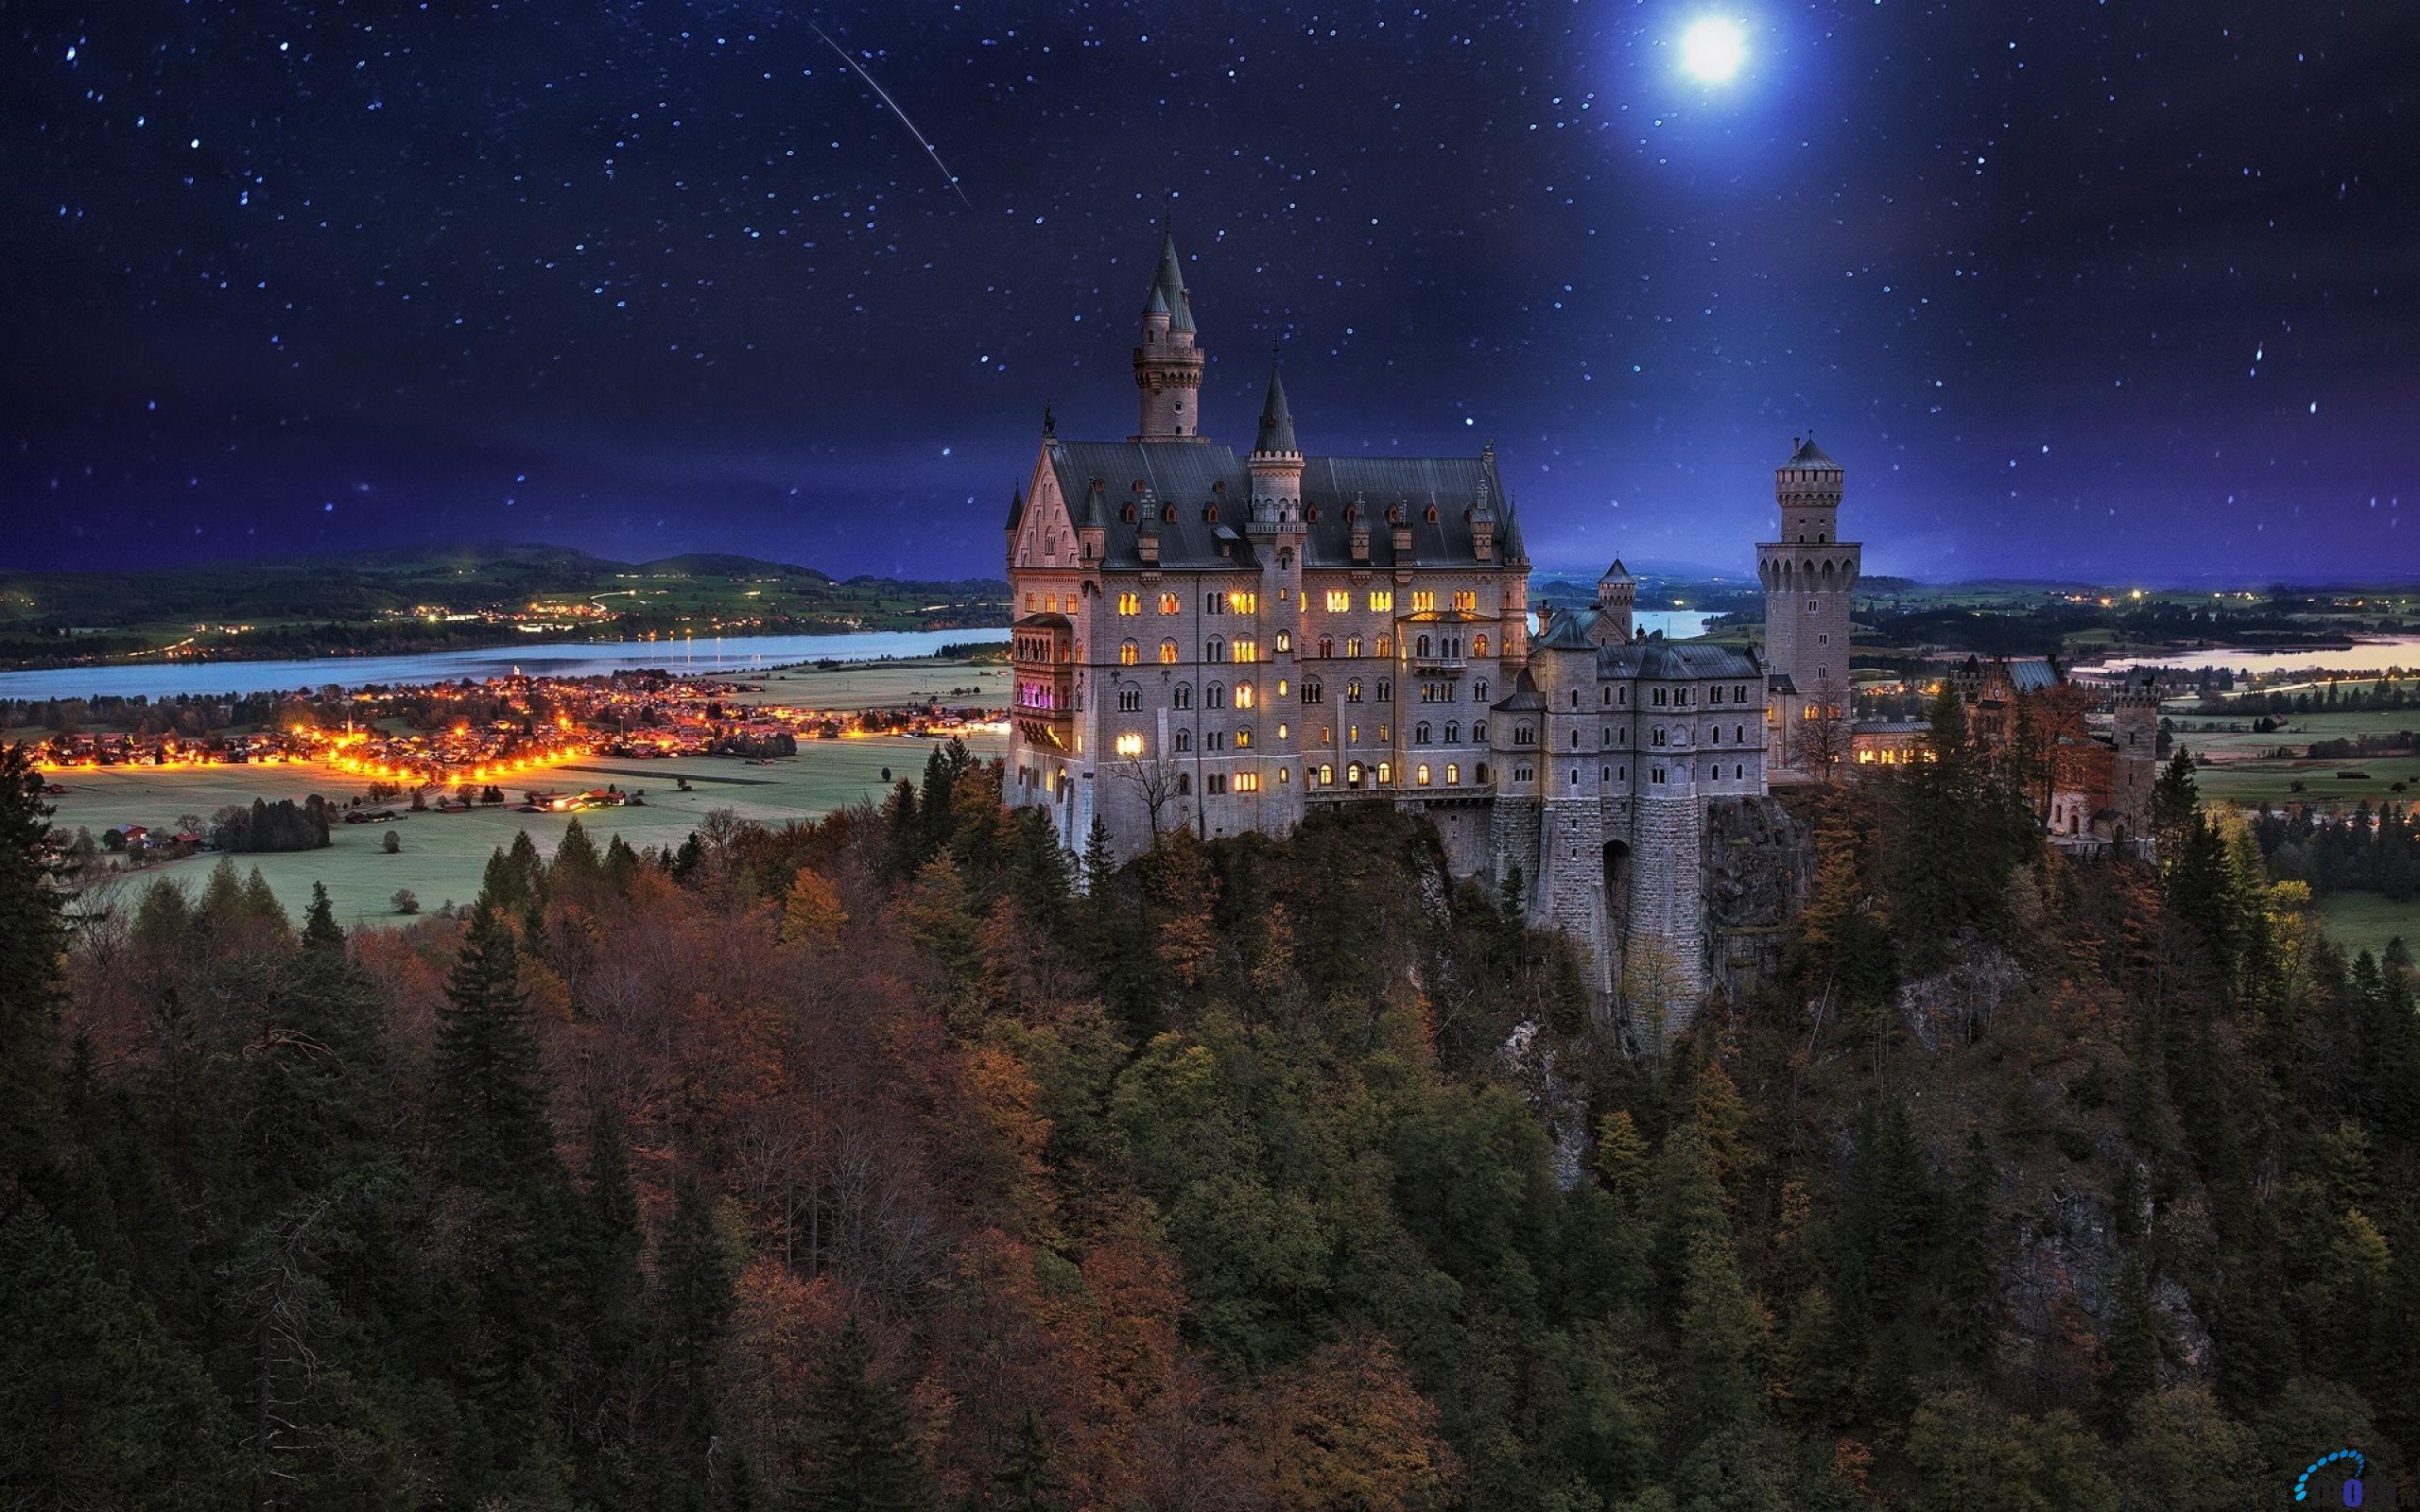 архитектура страны Замок Нойшванштайн Швангау Германия  № 2231548 бесплатно